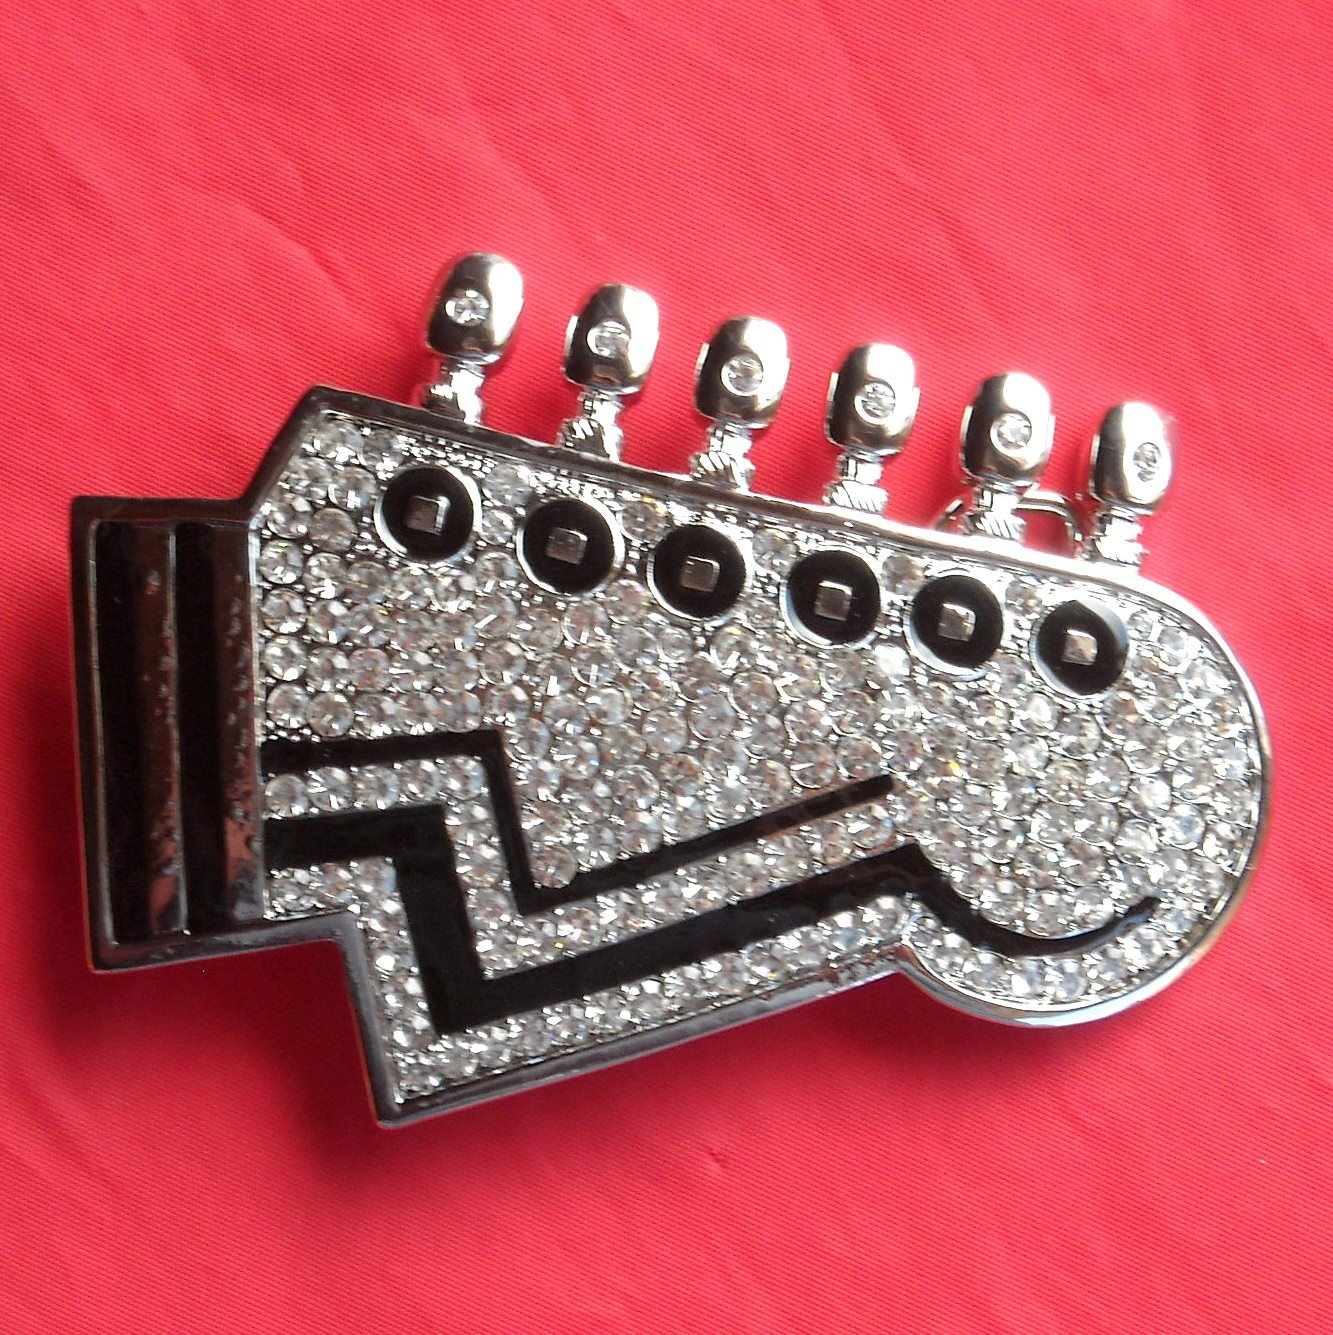 Silver color Guitar with Rhinestone metal belt buckle